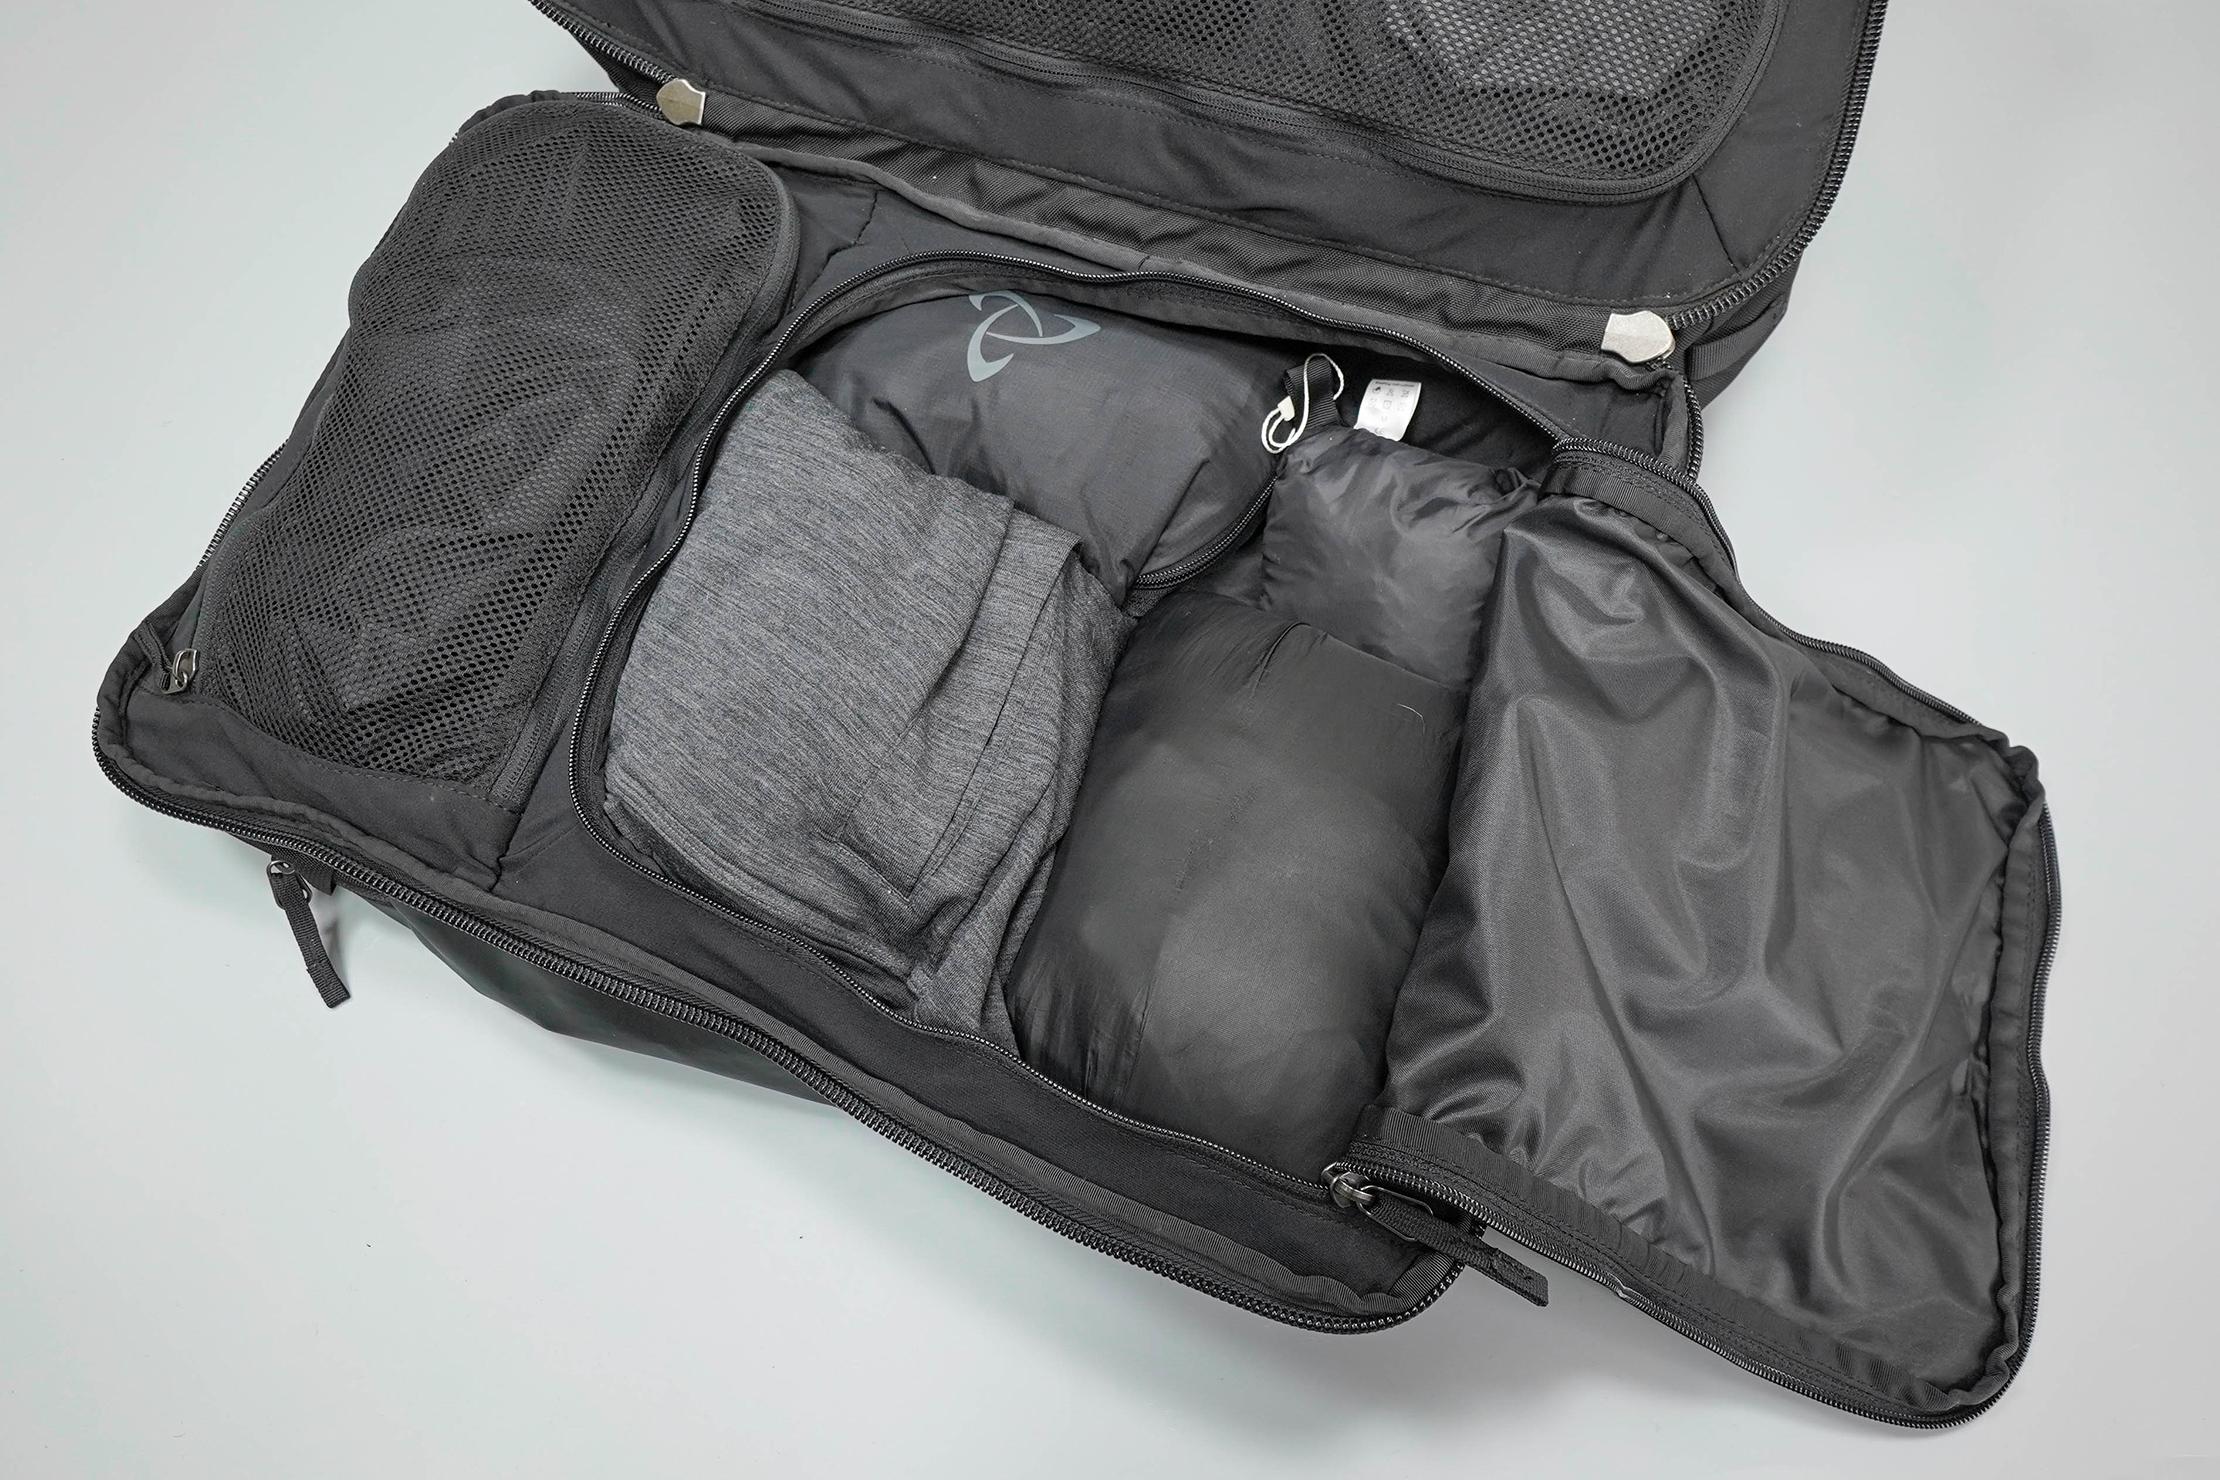 Cotopaxi Allpa 42L Main Compartment, Left Side Bottom Pocket